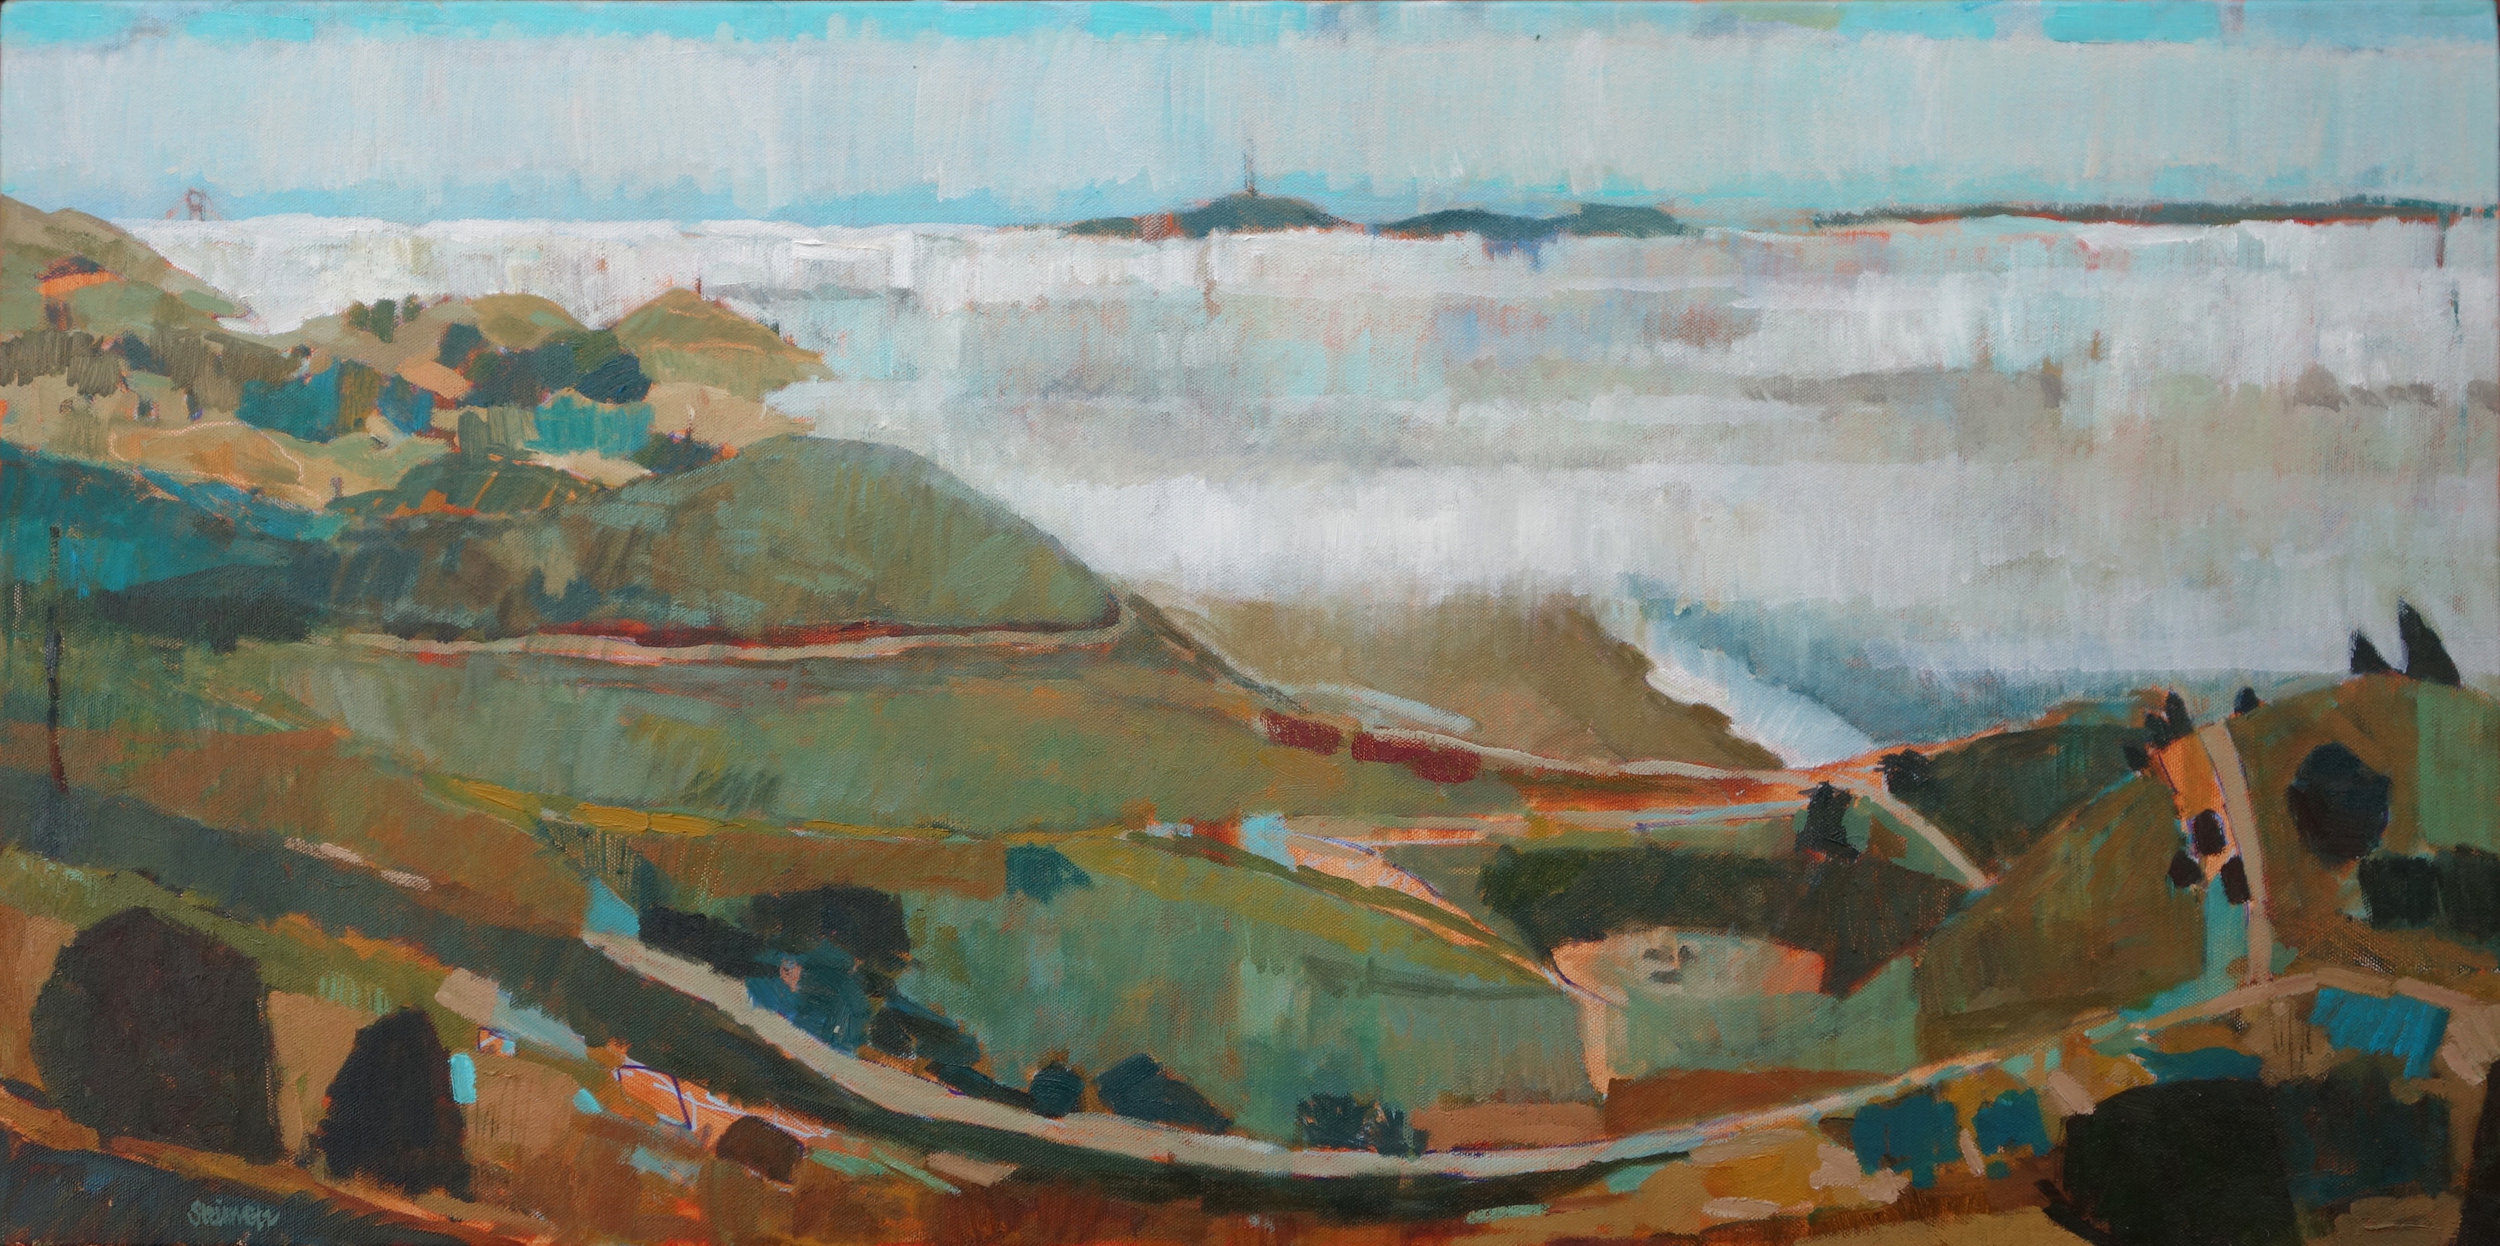 Headlands_Surf_and_Fog_oil_landscape_painting_marin_county_liana_Steinmetz.jpg